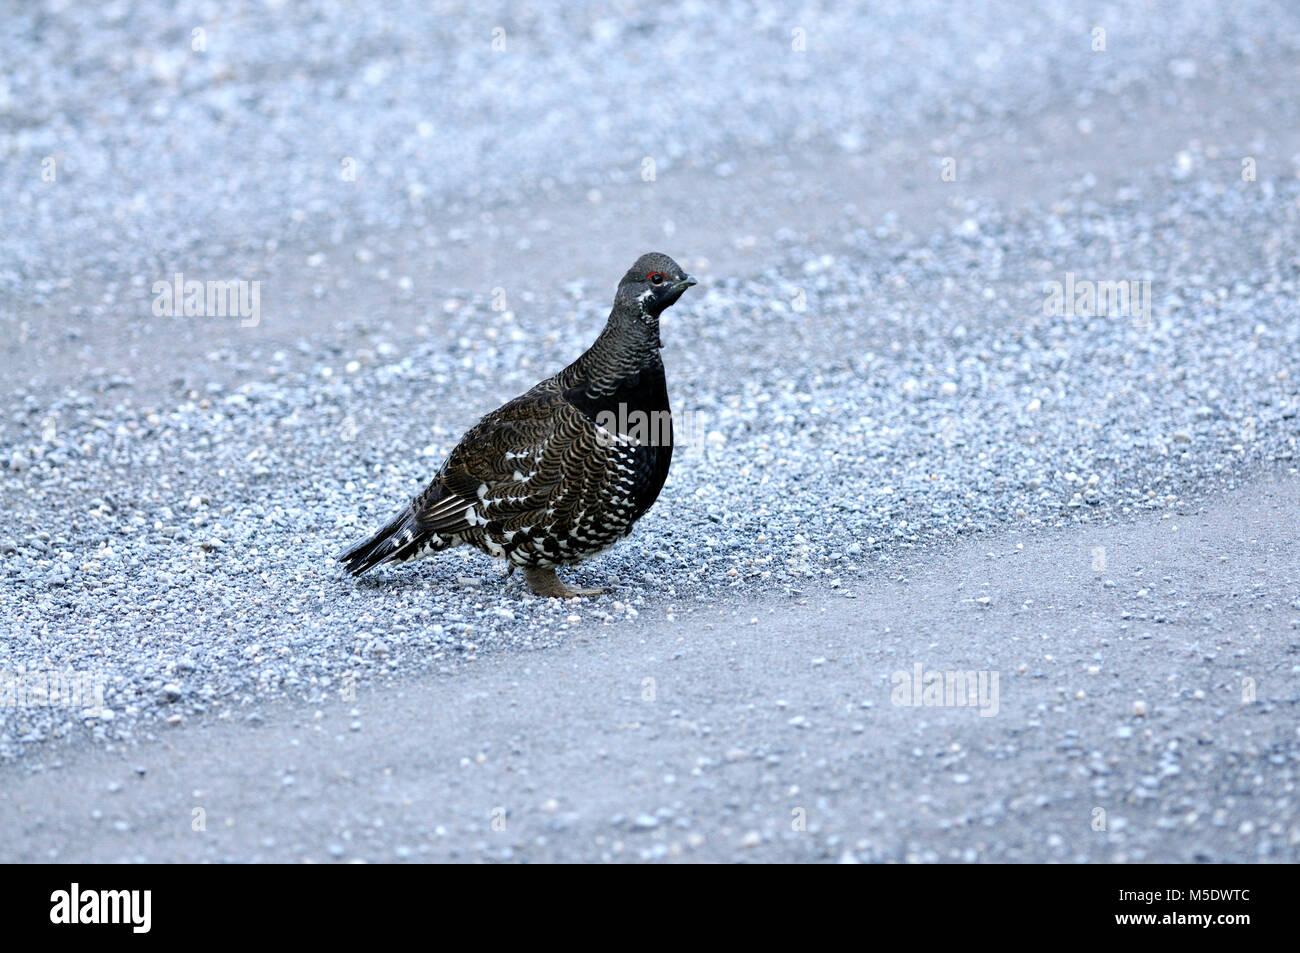 Spruce Grouse, Falcipennis canadensis, Phasianidae, Grouse, bird, animal, Jaspar National Park, Alberta, Canada - Stock Image